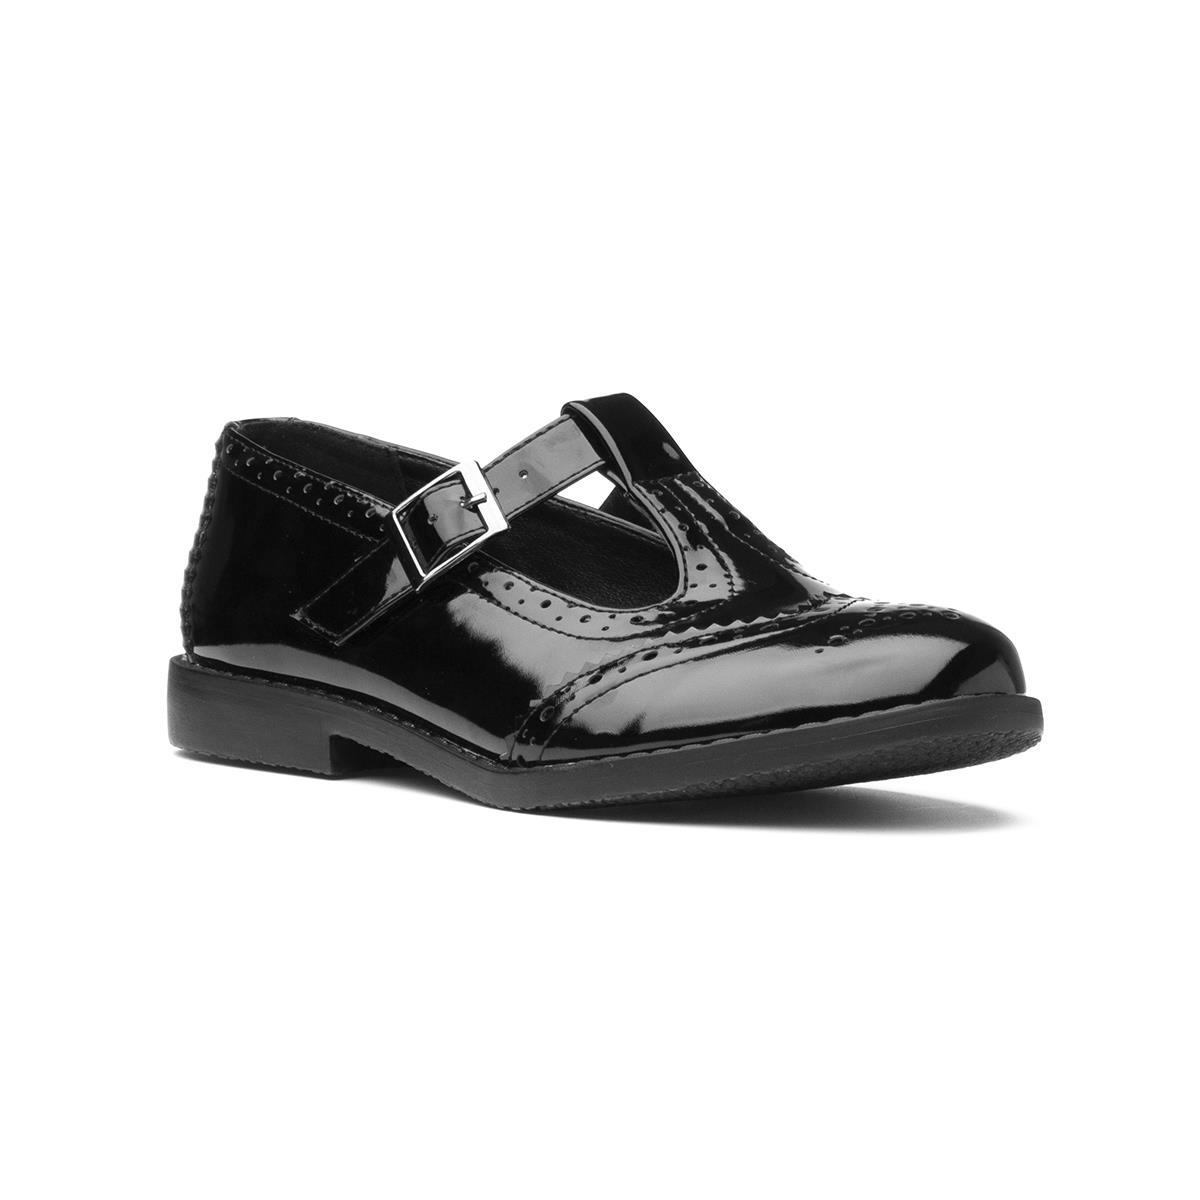 Lilley Womens Patent Black T-Bar Shoe